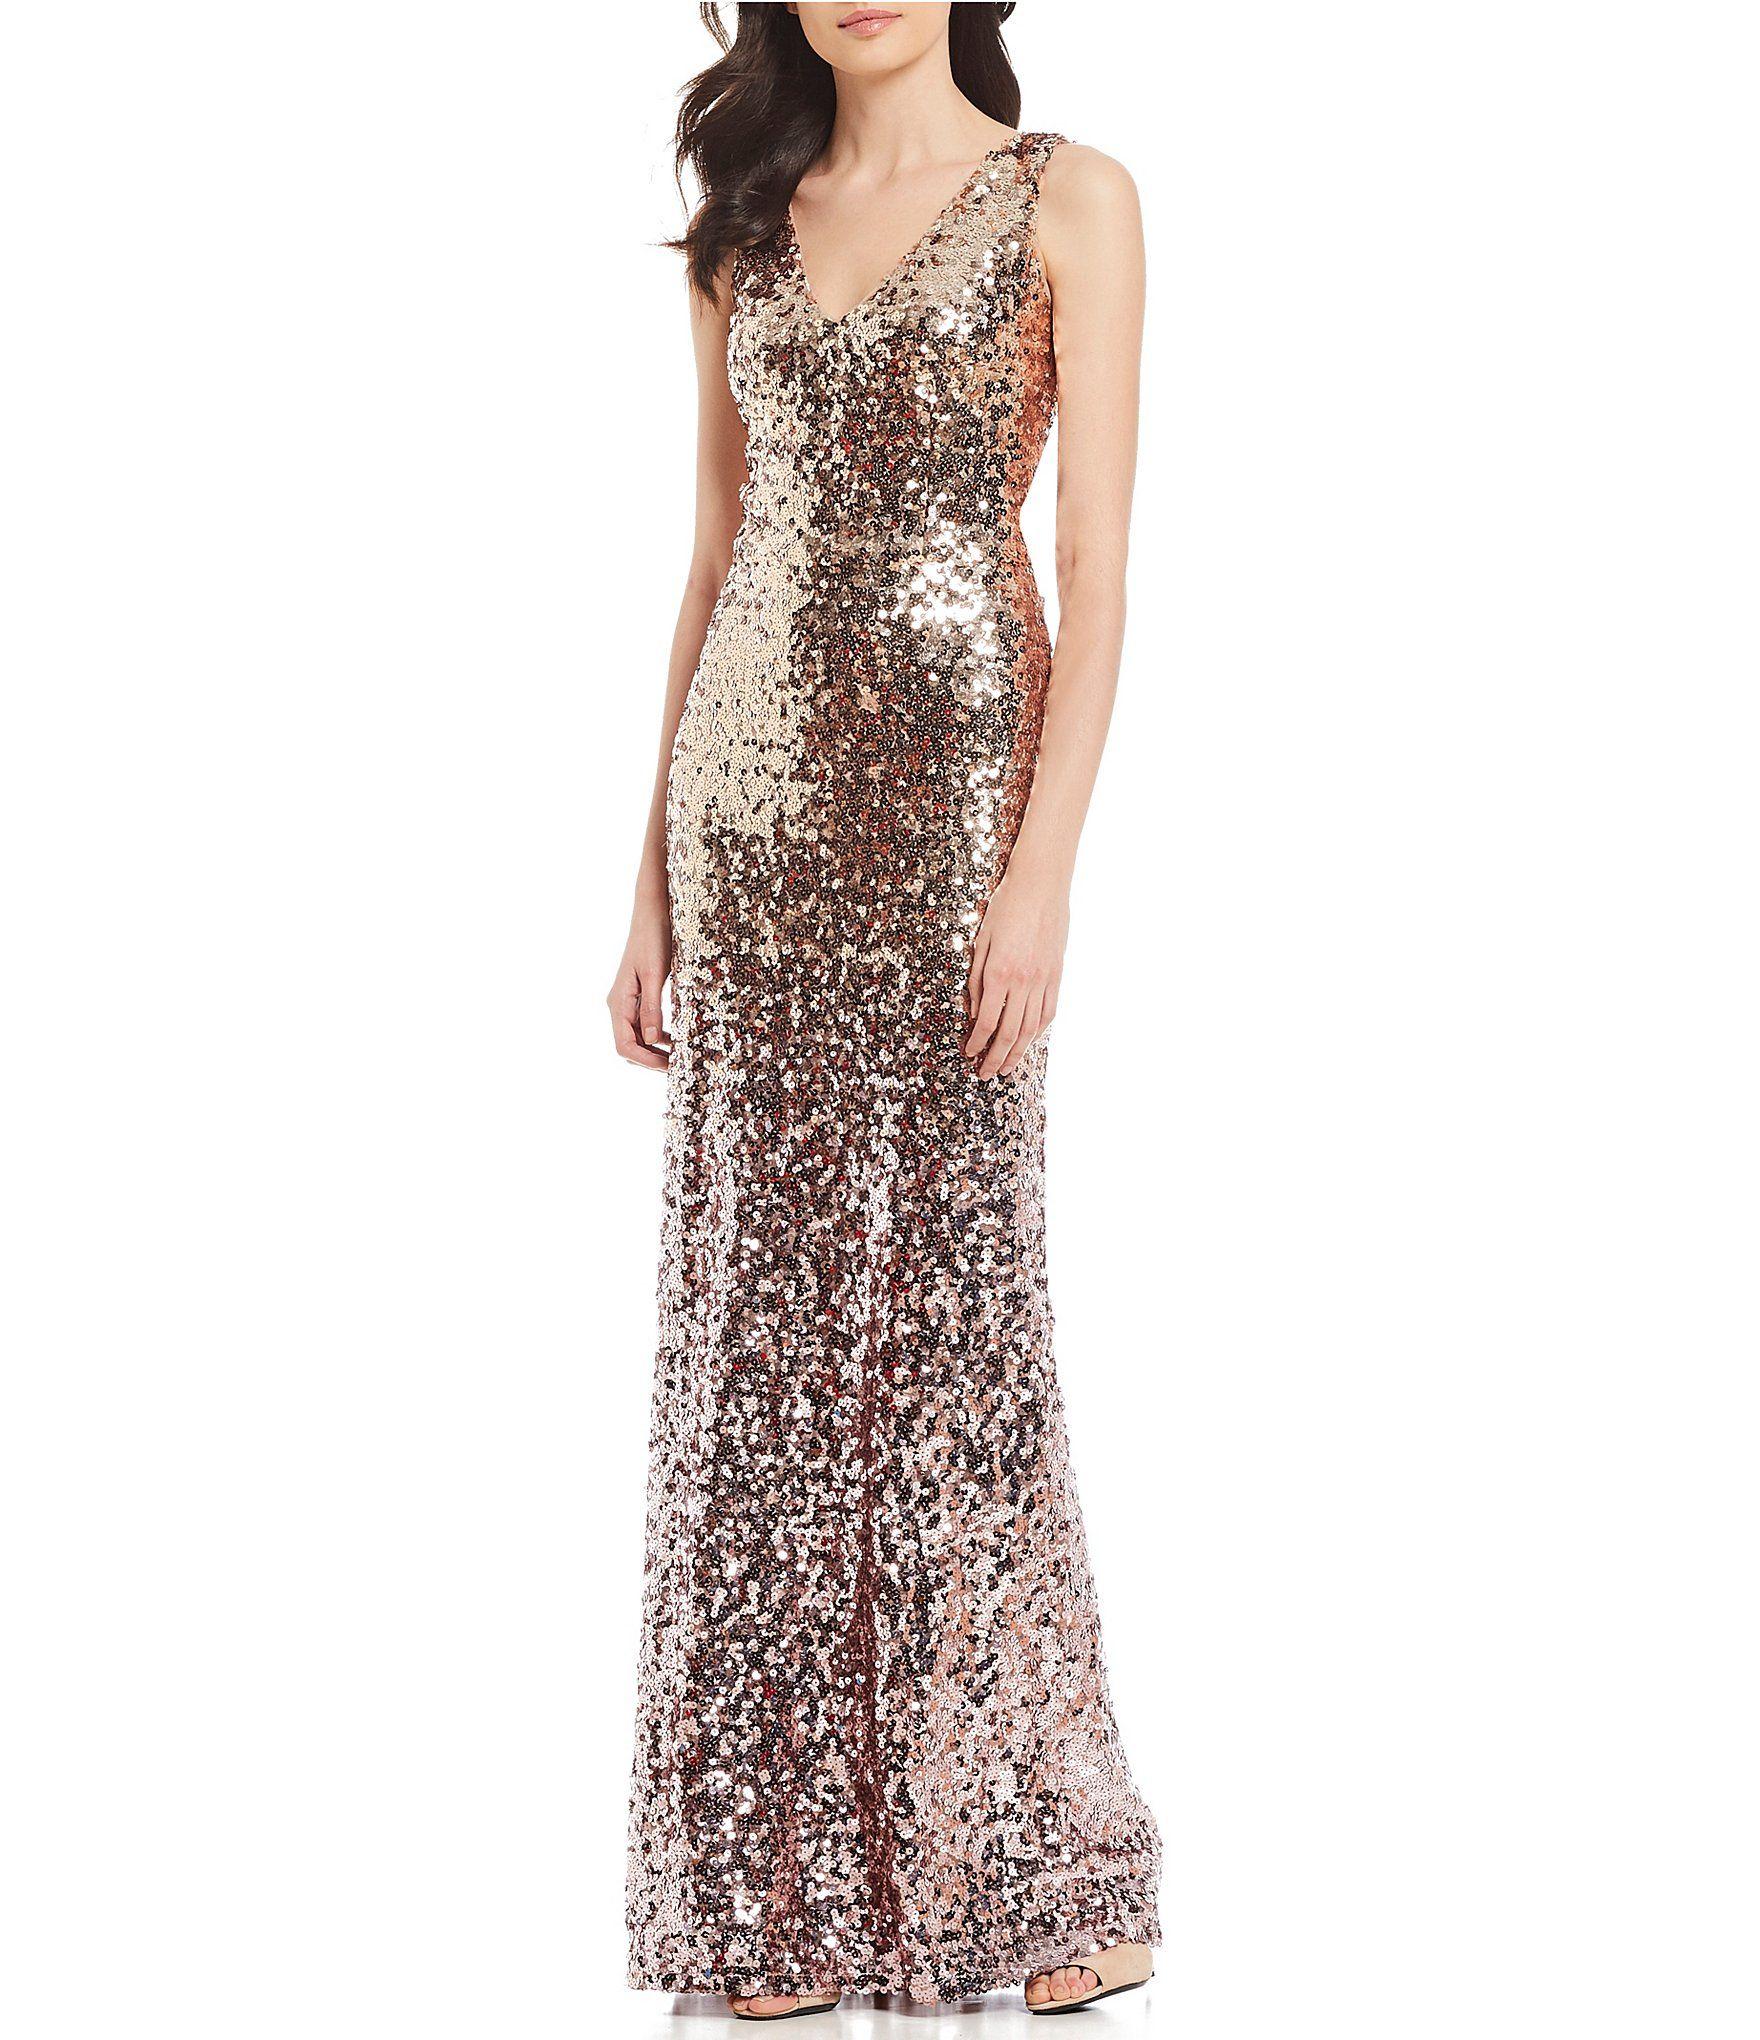 20145b6d79 Marina Sleeveless V Neck Ombre Sequin Gown  Dillards